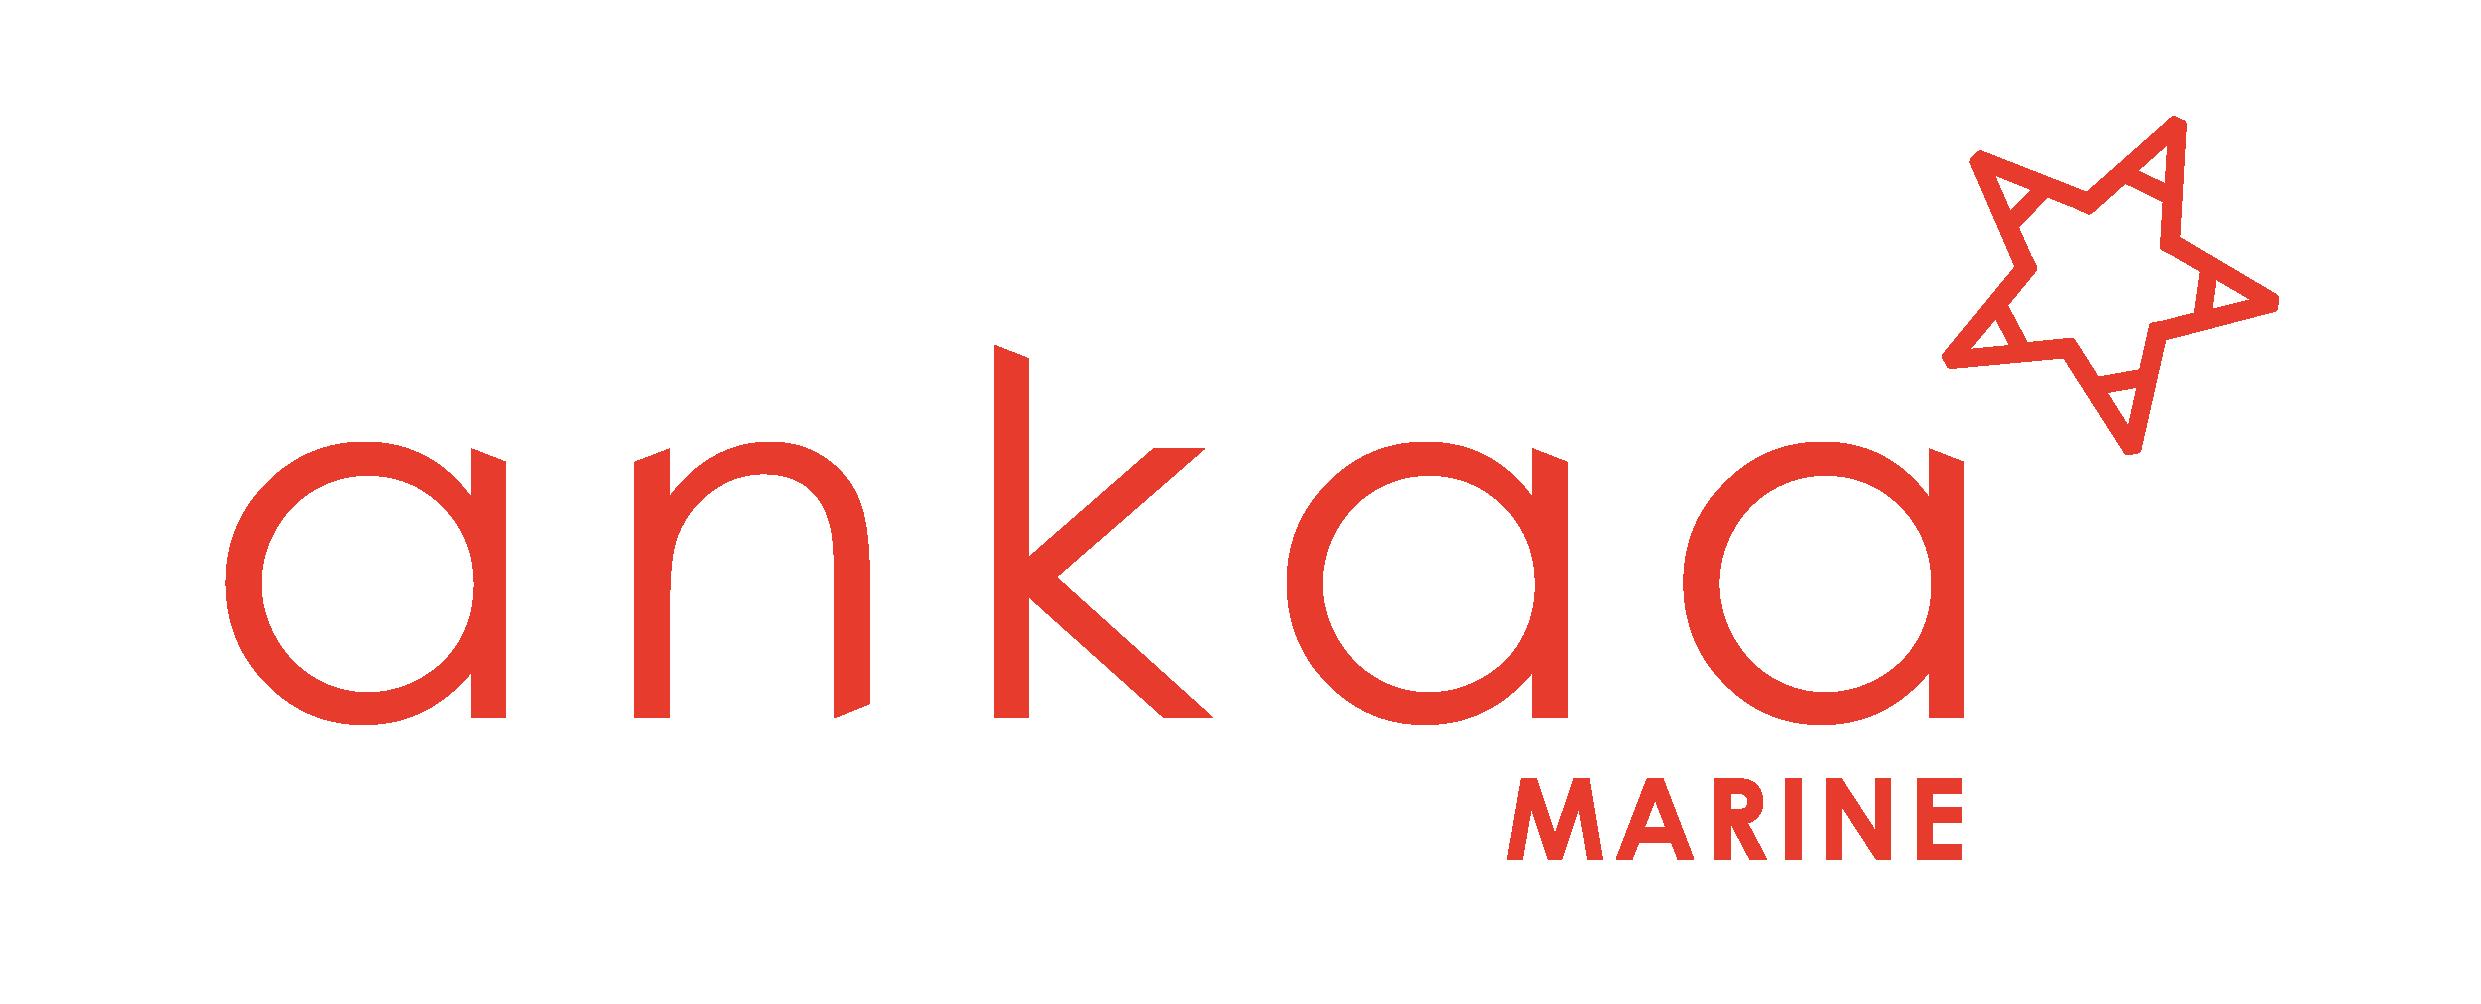 Ankaa Marine.png